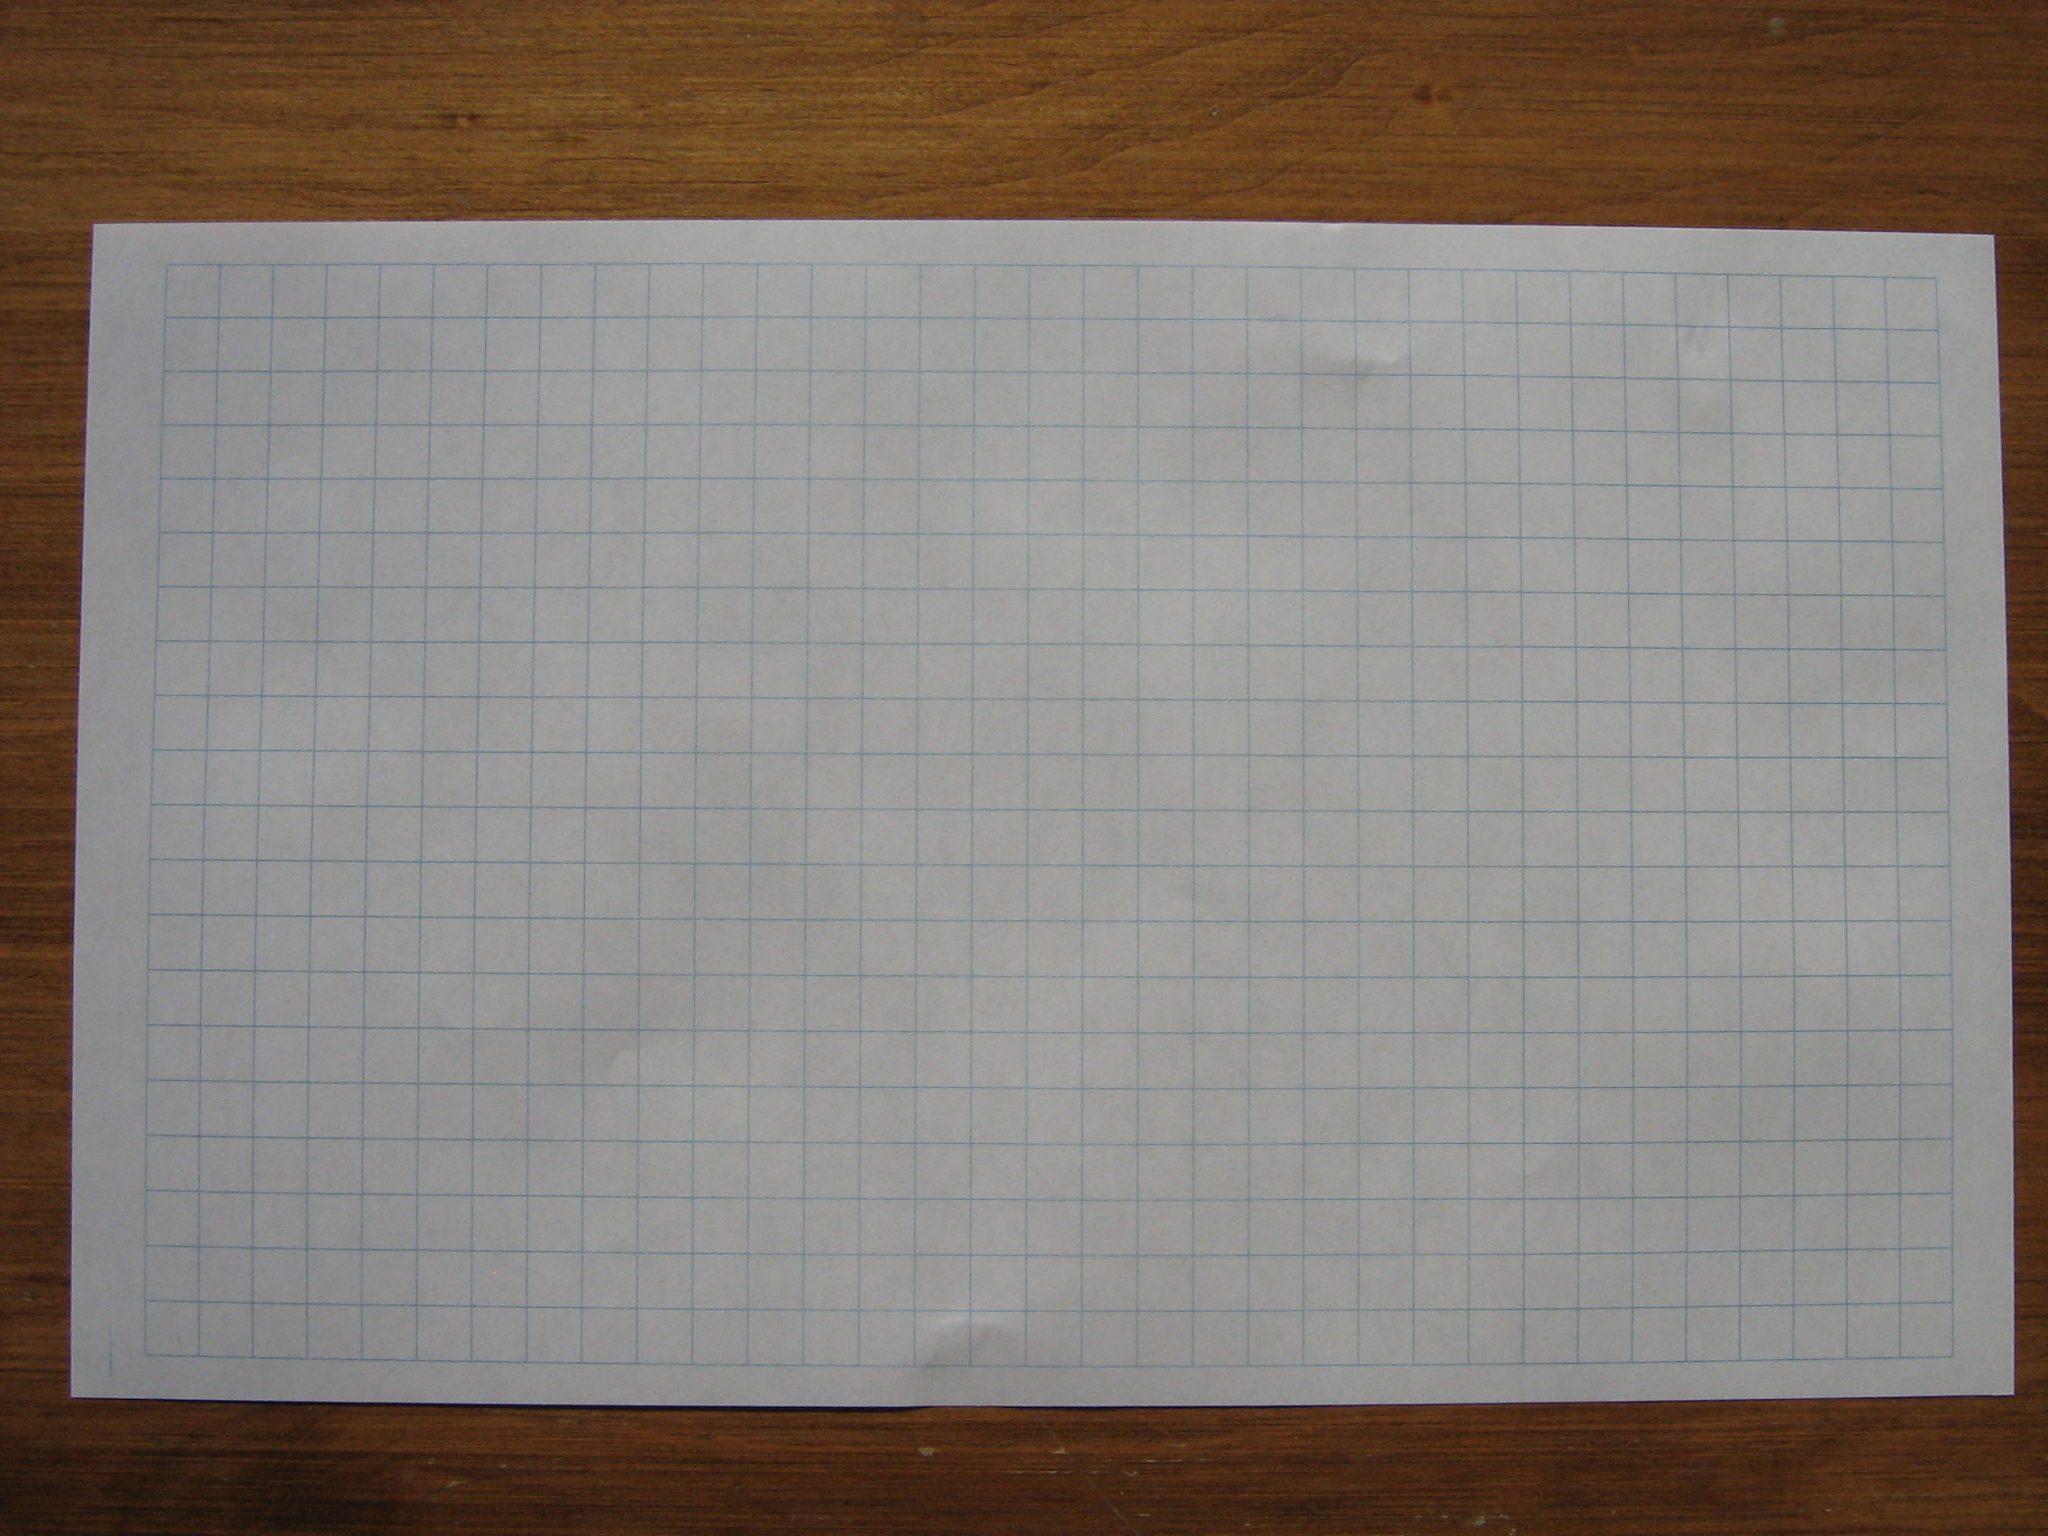 36b full size 1 cm graph paper 8 5 u0026quot  x 14 u0026quot   pkg